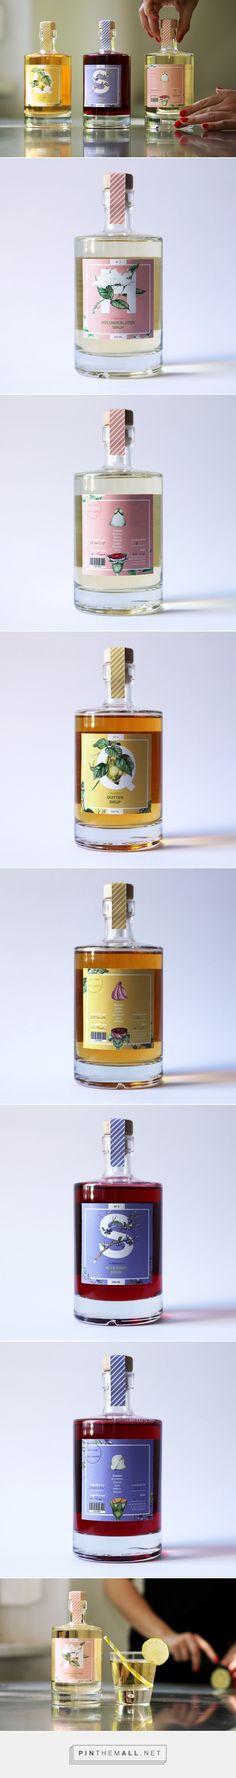 Mamas Best Sirup Packaging by Hannah Rosenkranz | Fivestar Branding – Design and Branding Agency & Inspiration Gallery